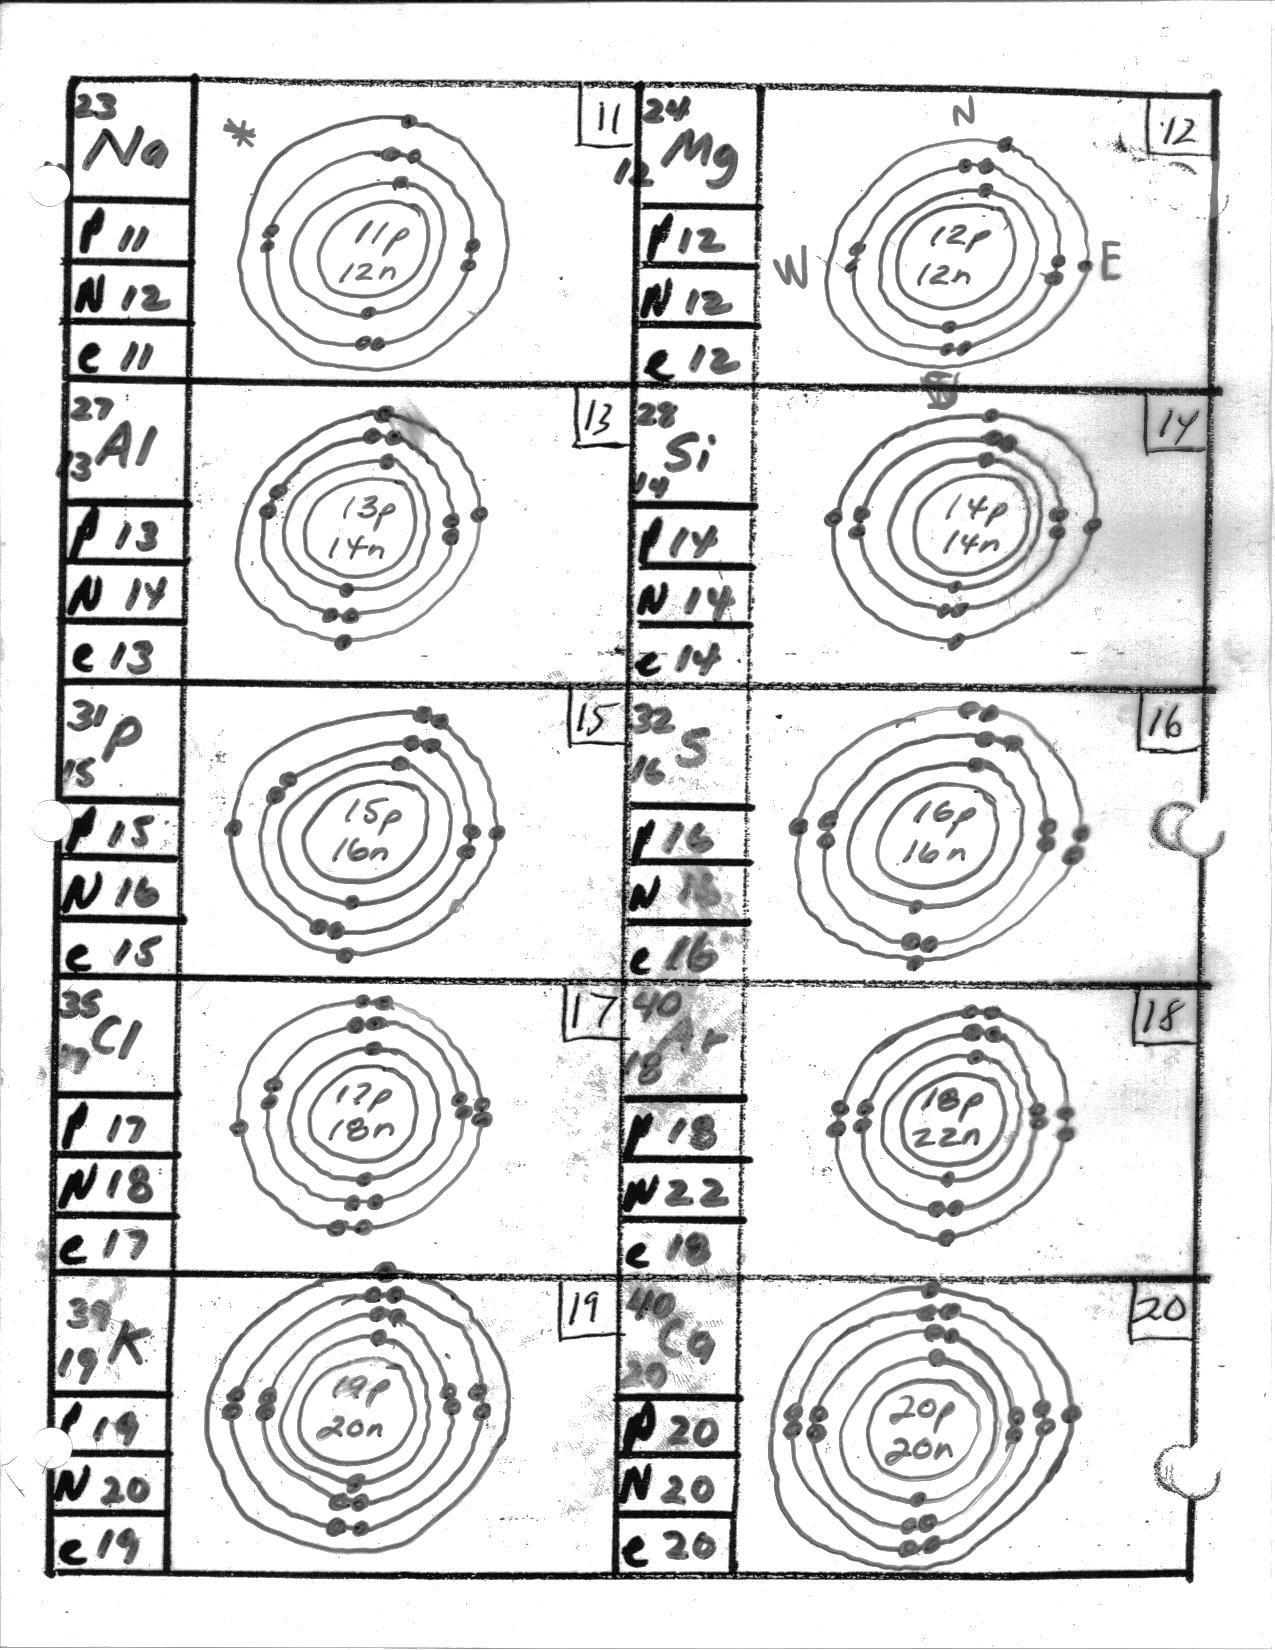 Printables Bohr Model Worksheet Messygracebook Thousands Of